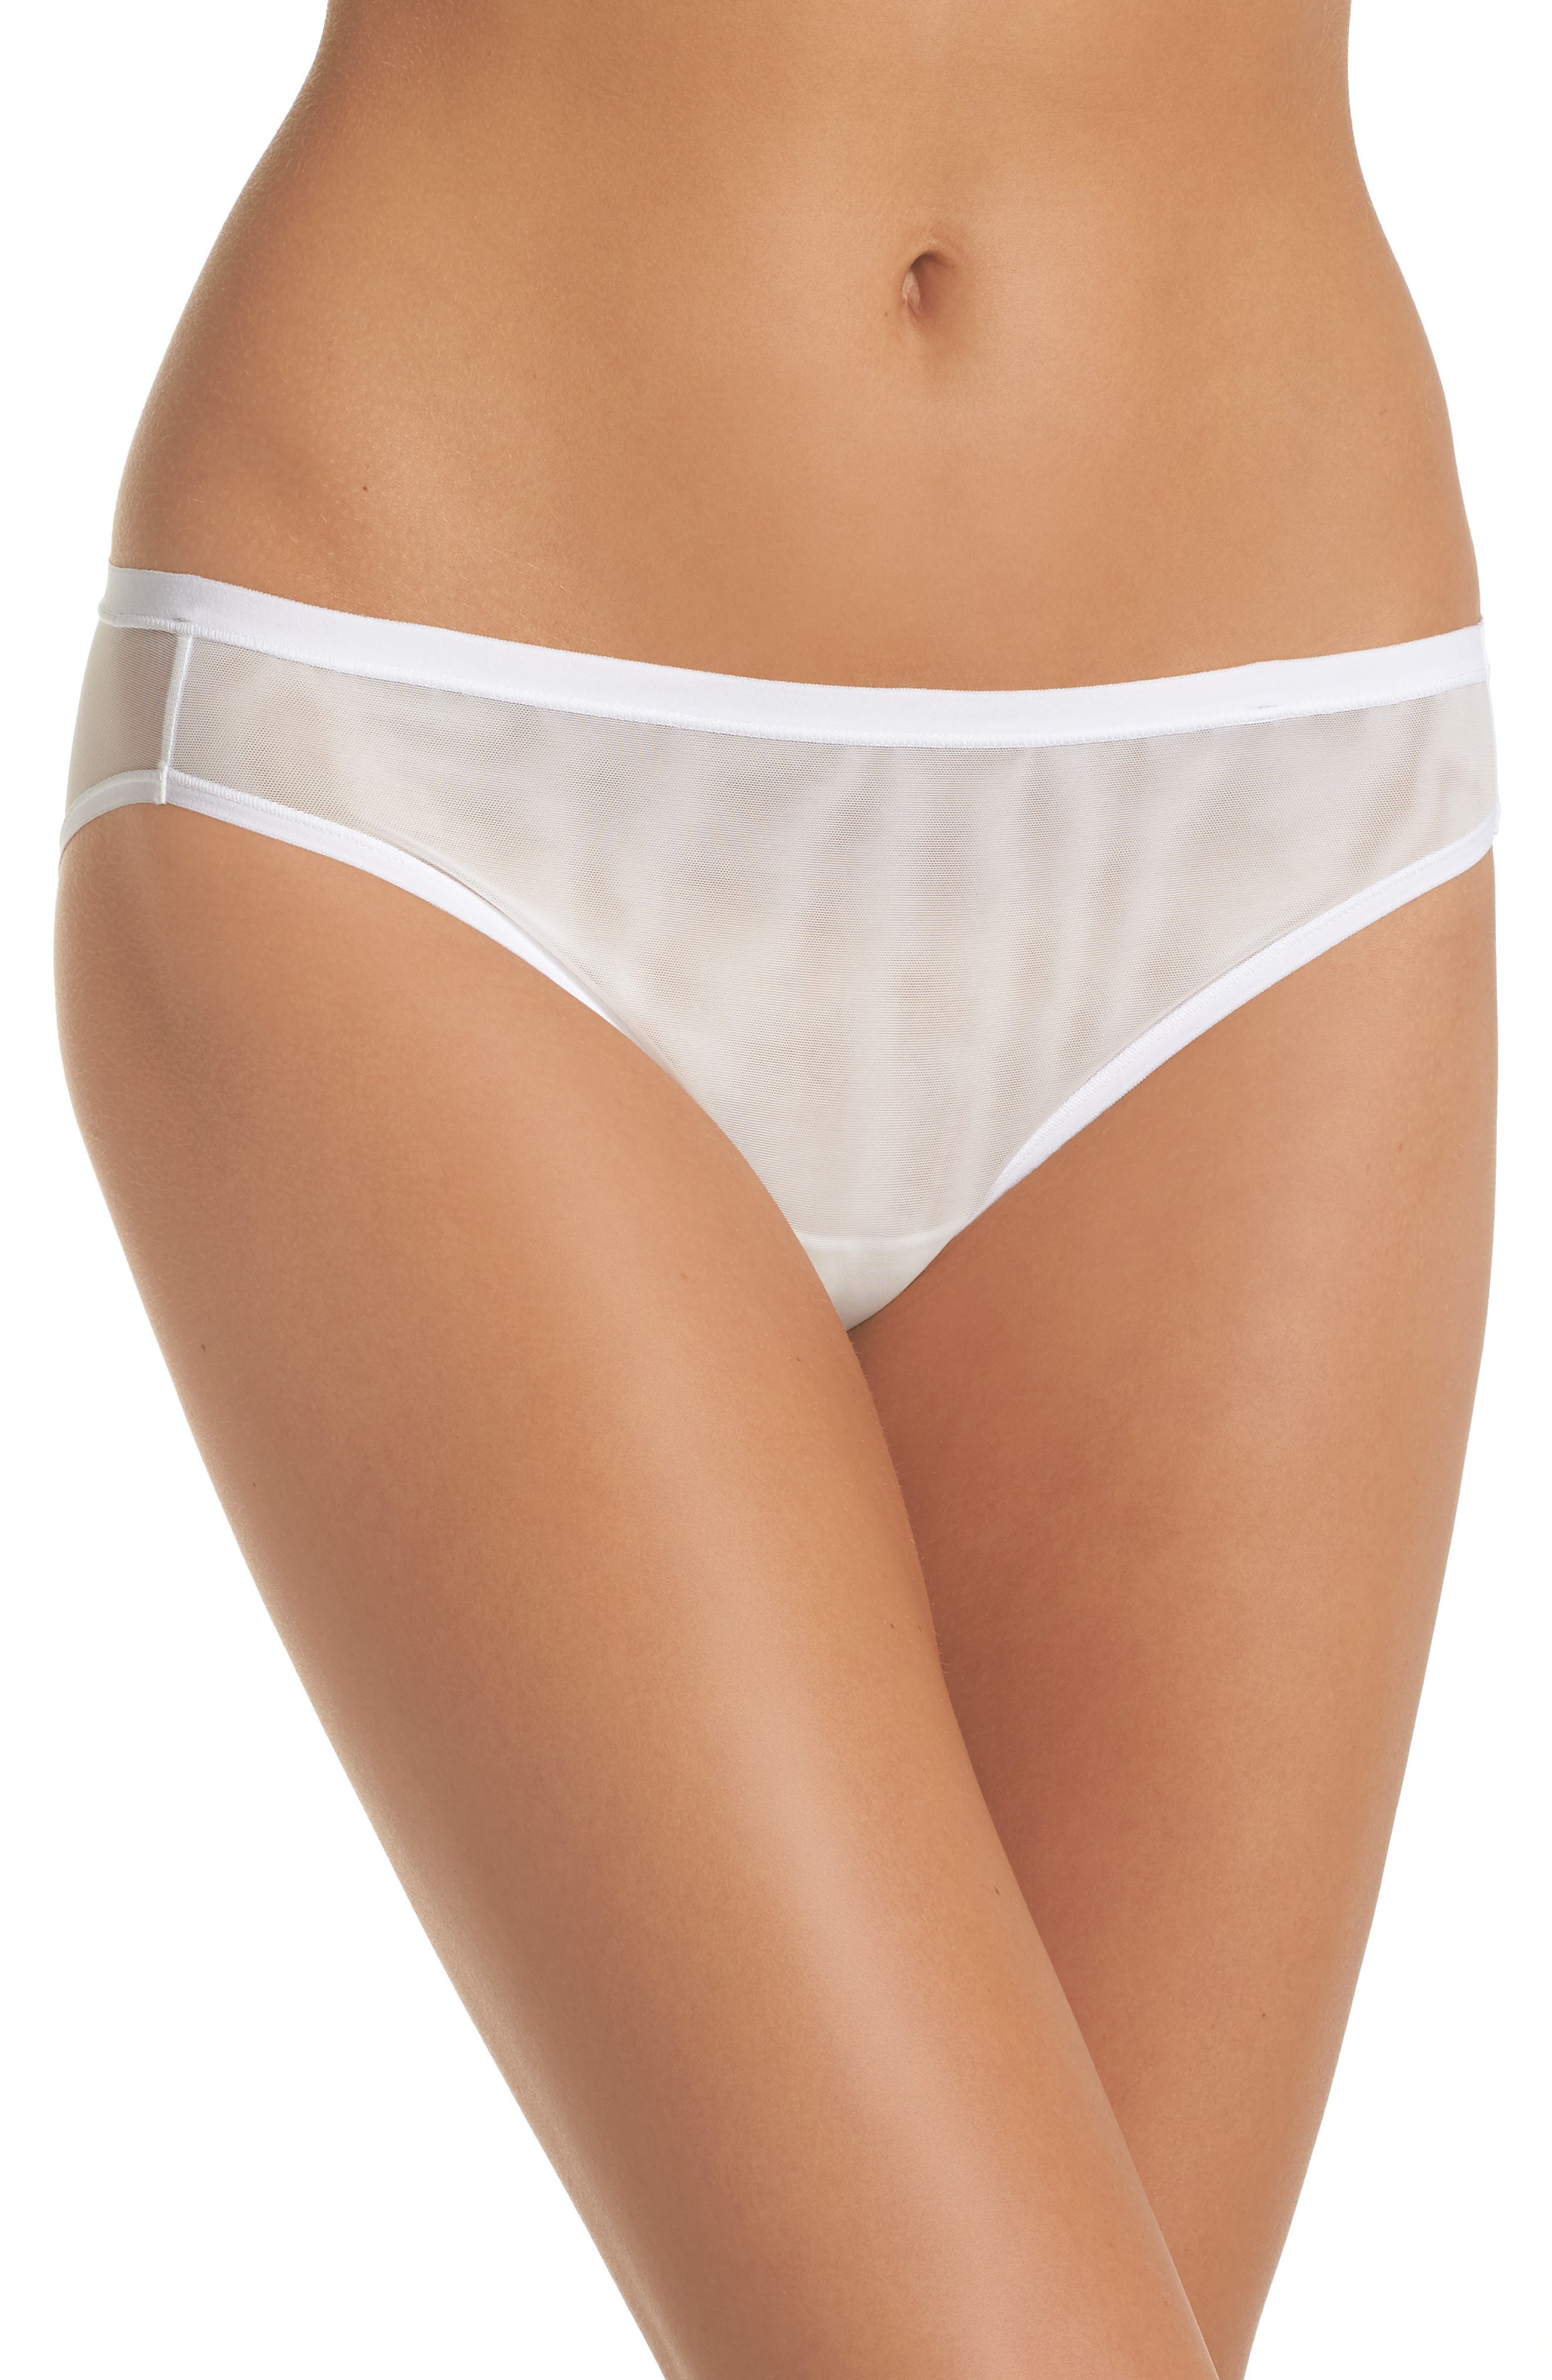 Bliss Light Bikini,                         Main,                         color, White